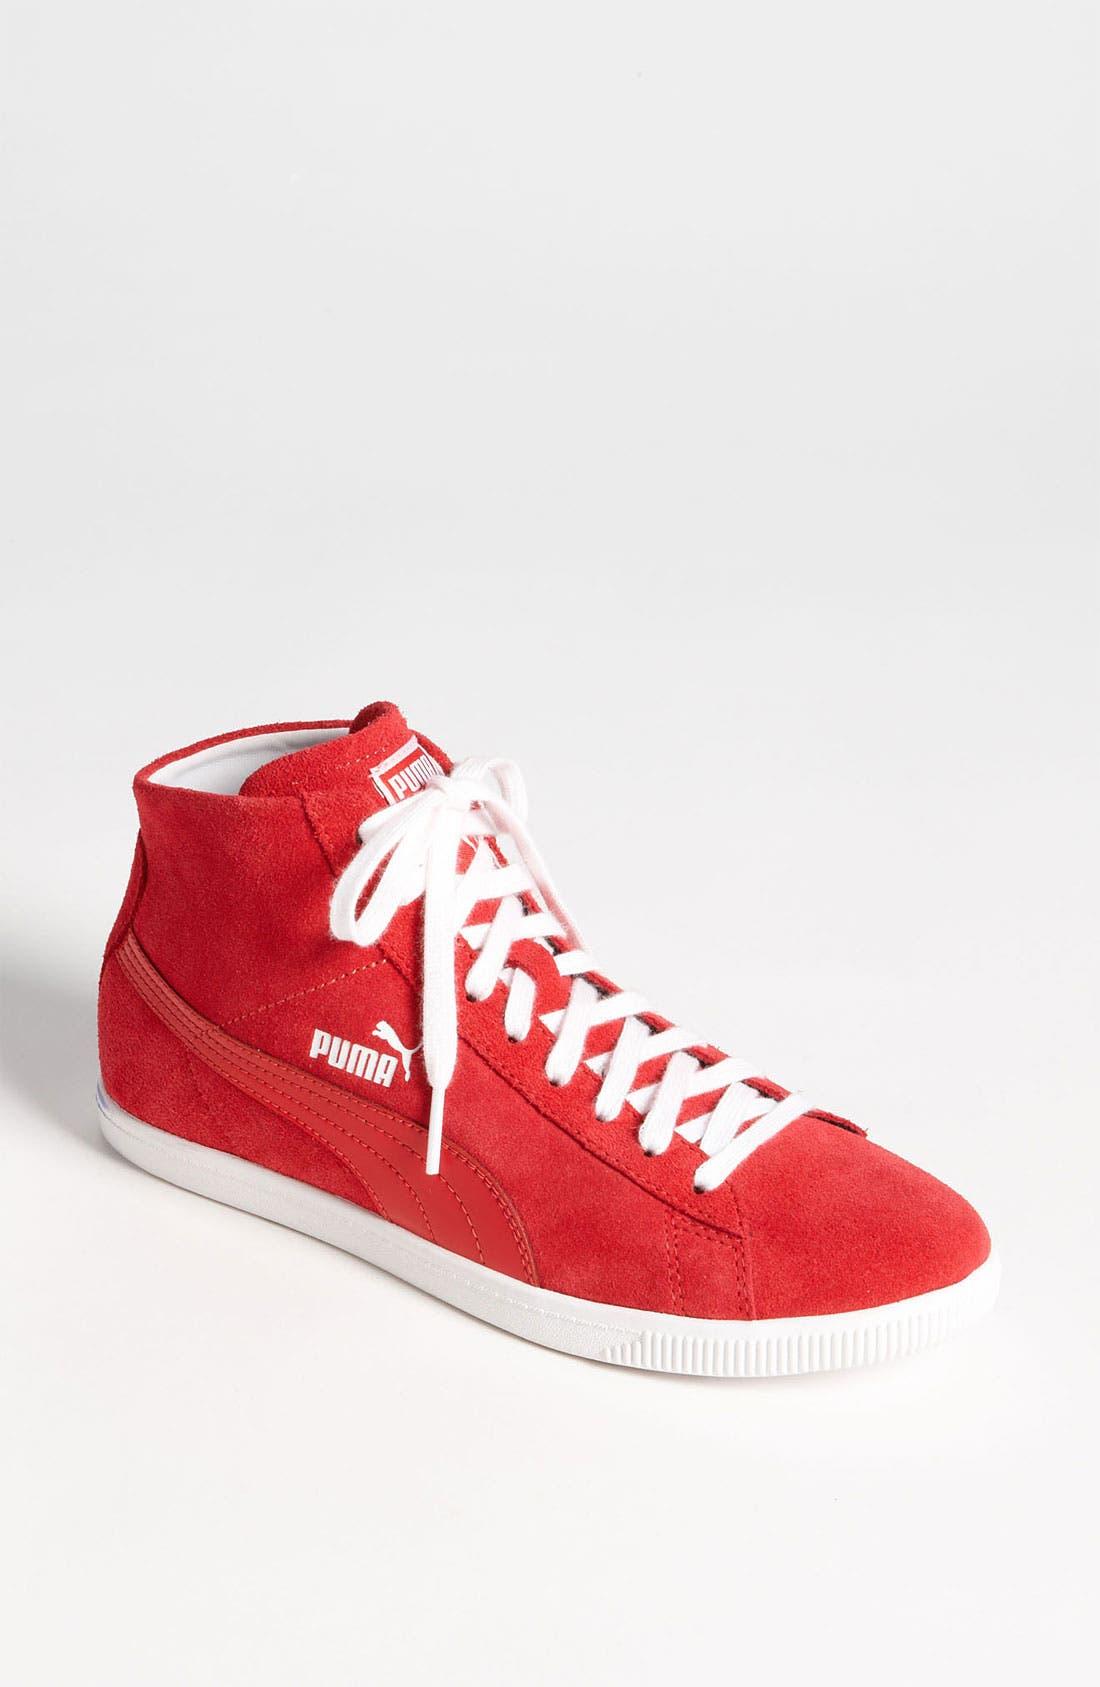 Main Image - PUMA 'Glyde Mid' Sneaker (Women)